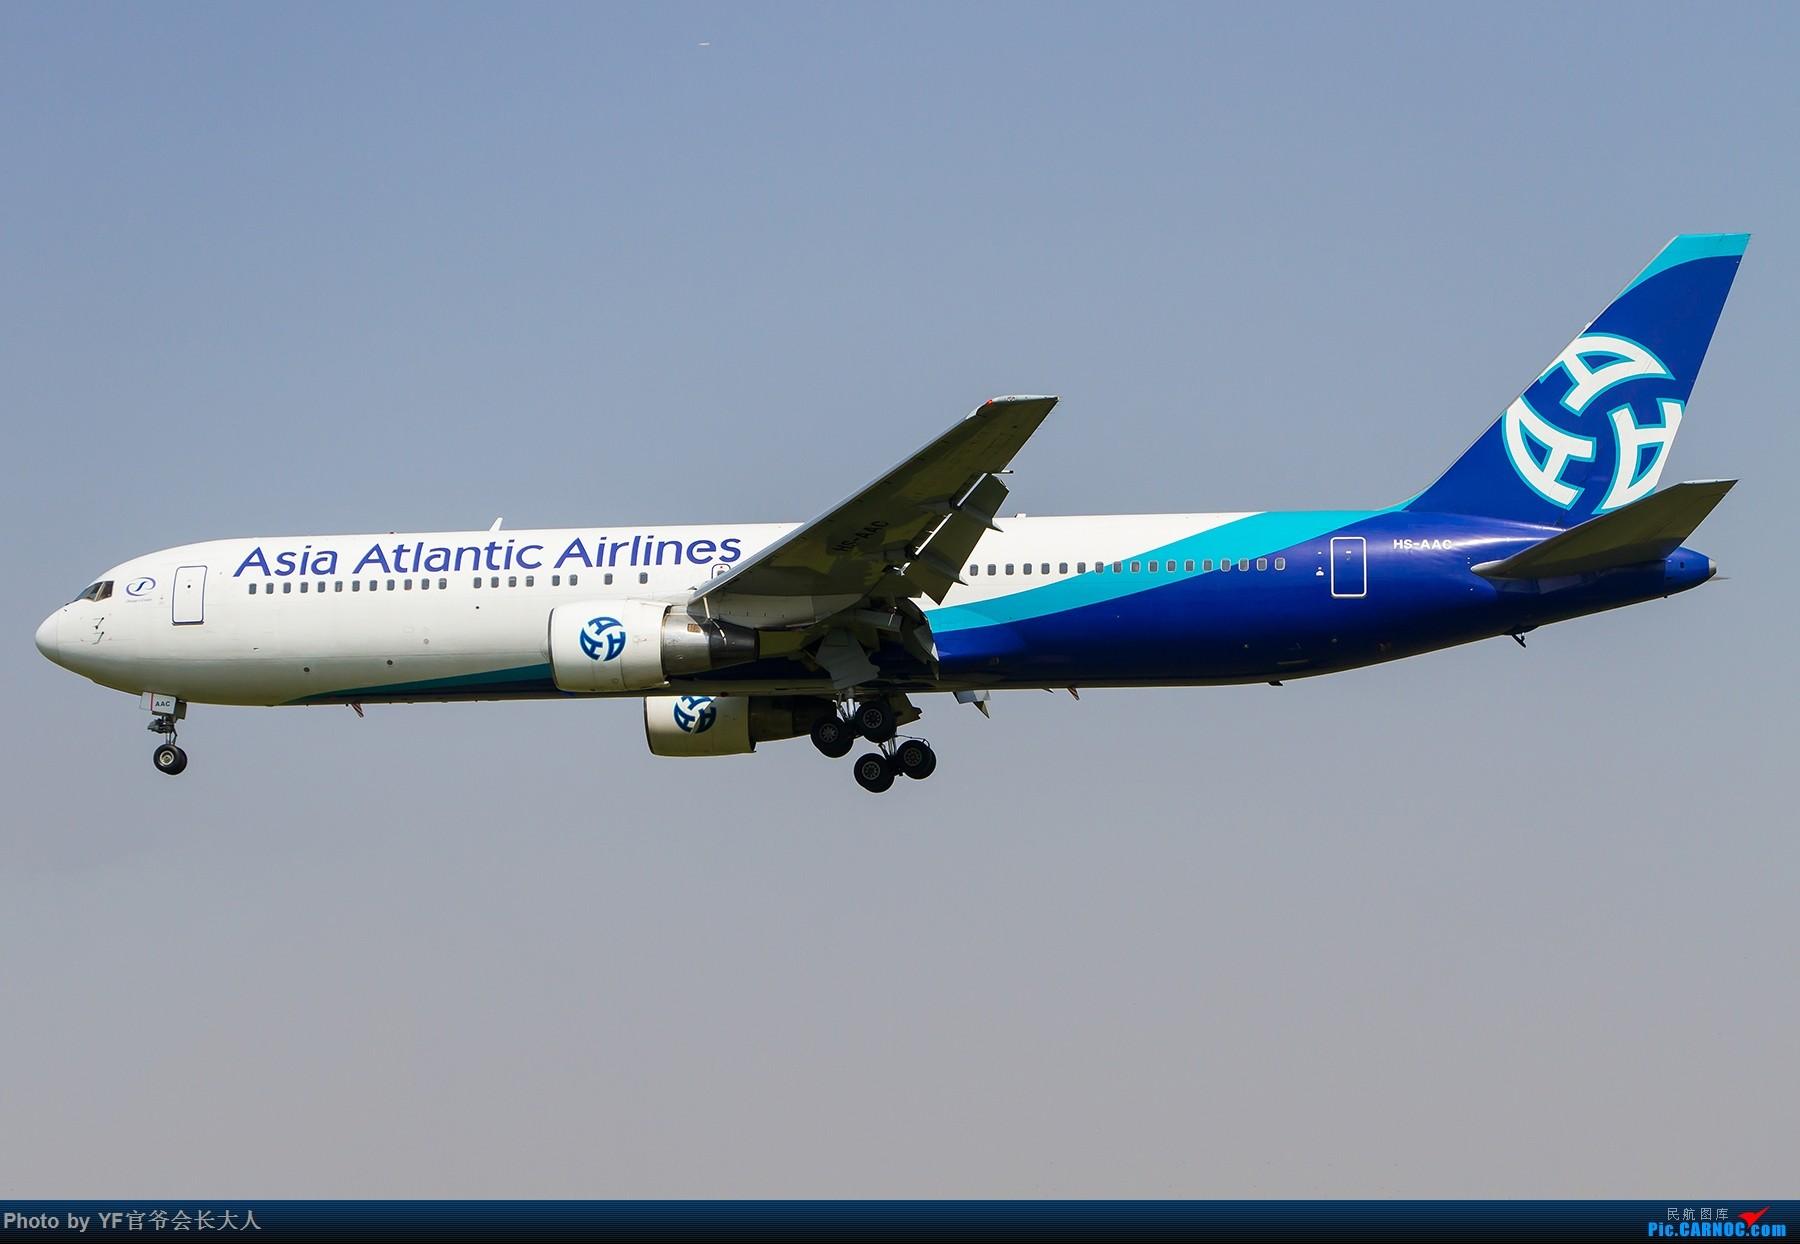 Re:[原创]【ZYTX】轻易不拍机,拍就要拍个过瘾!(新开的酷鸟,亚洲大西洋,顺带碰上朝韩两国的好货) BOEING 767-300 HS-AAC 中国沈阳桃仙国际机场